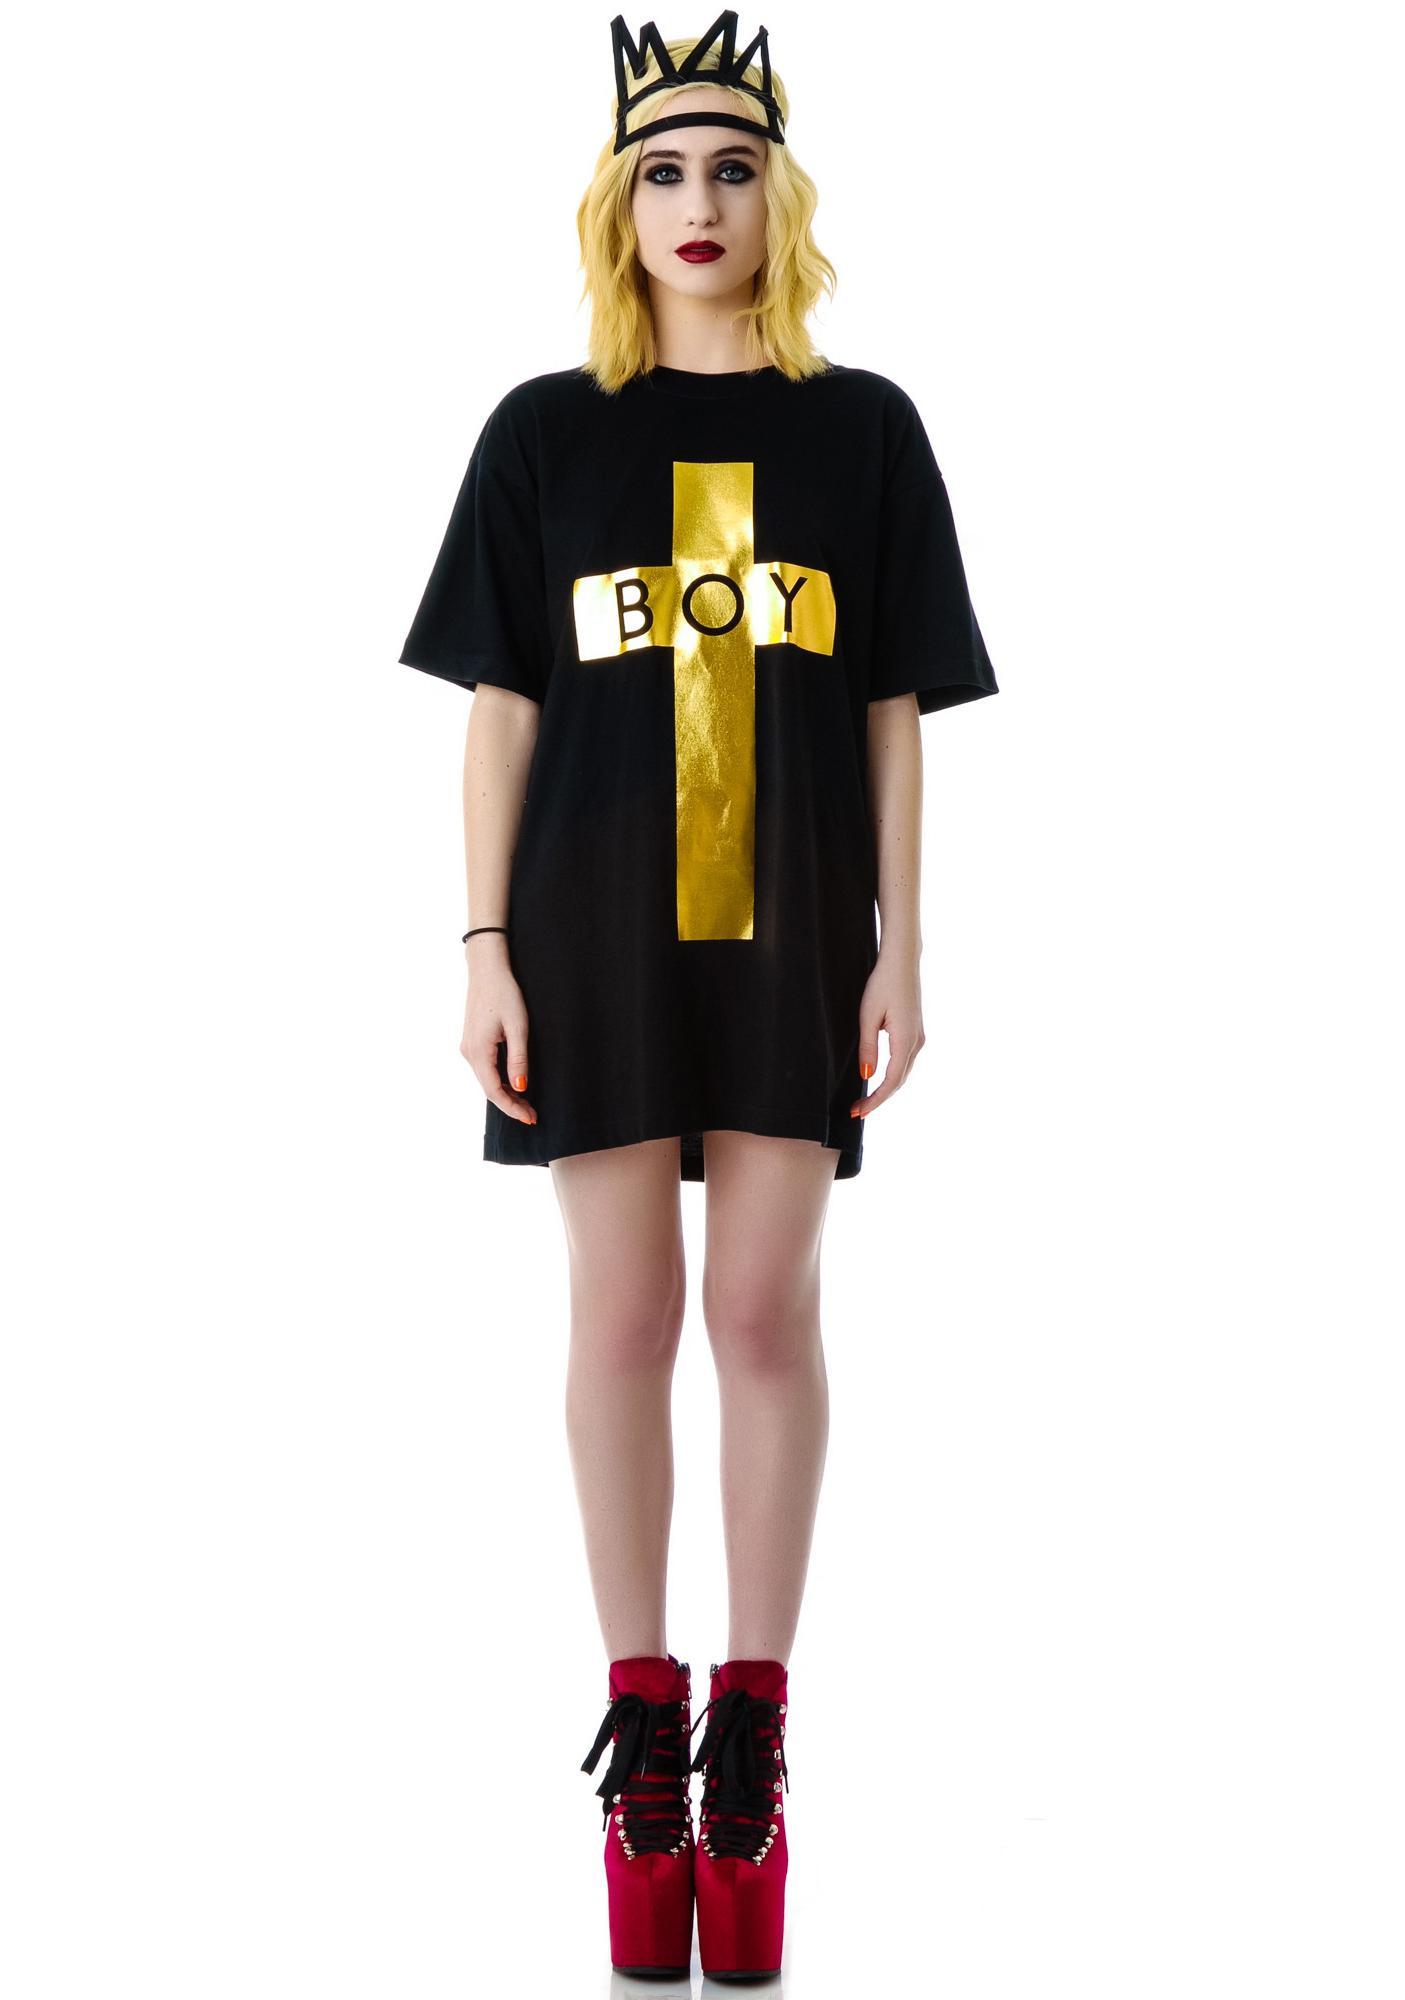 Long Clothing x BOY London Boy Cross Oversized Tee